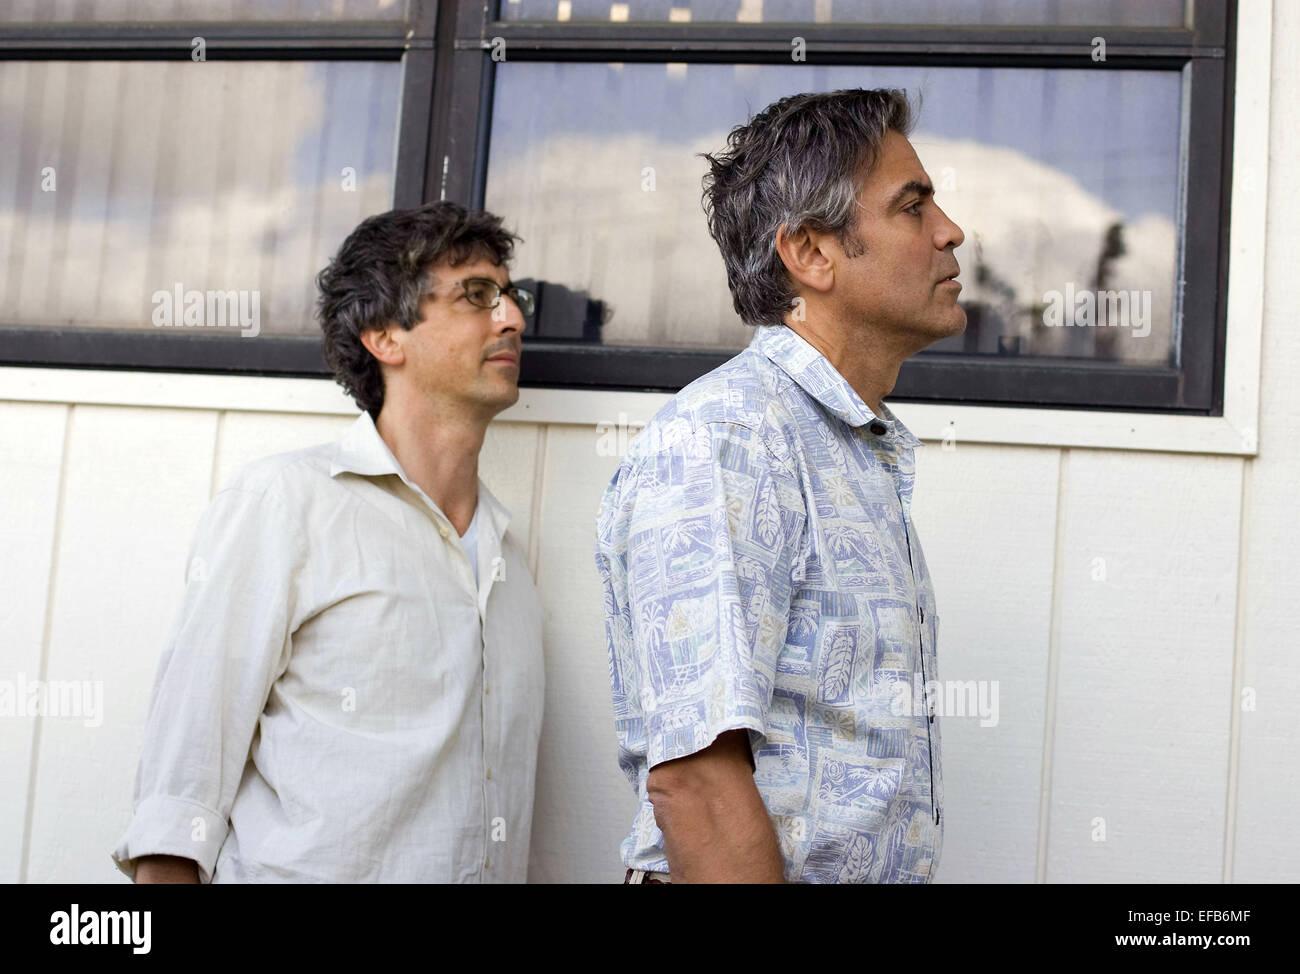 Alexander Payne George Clooney The Descendants 2011 Stock Photo Alamy